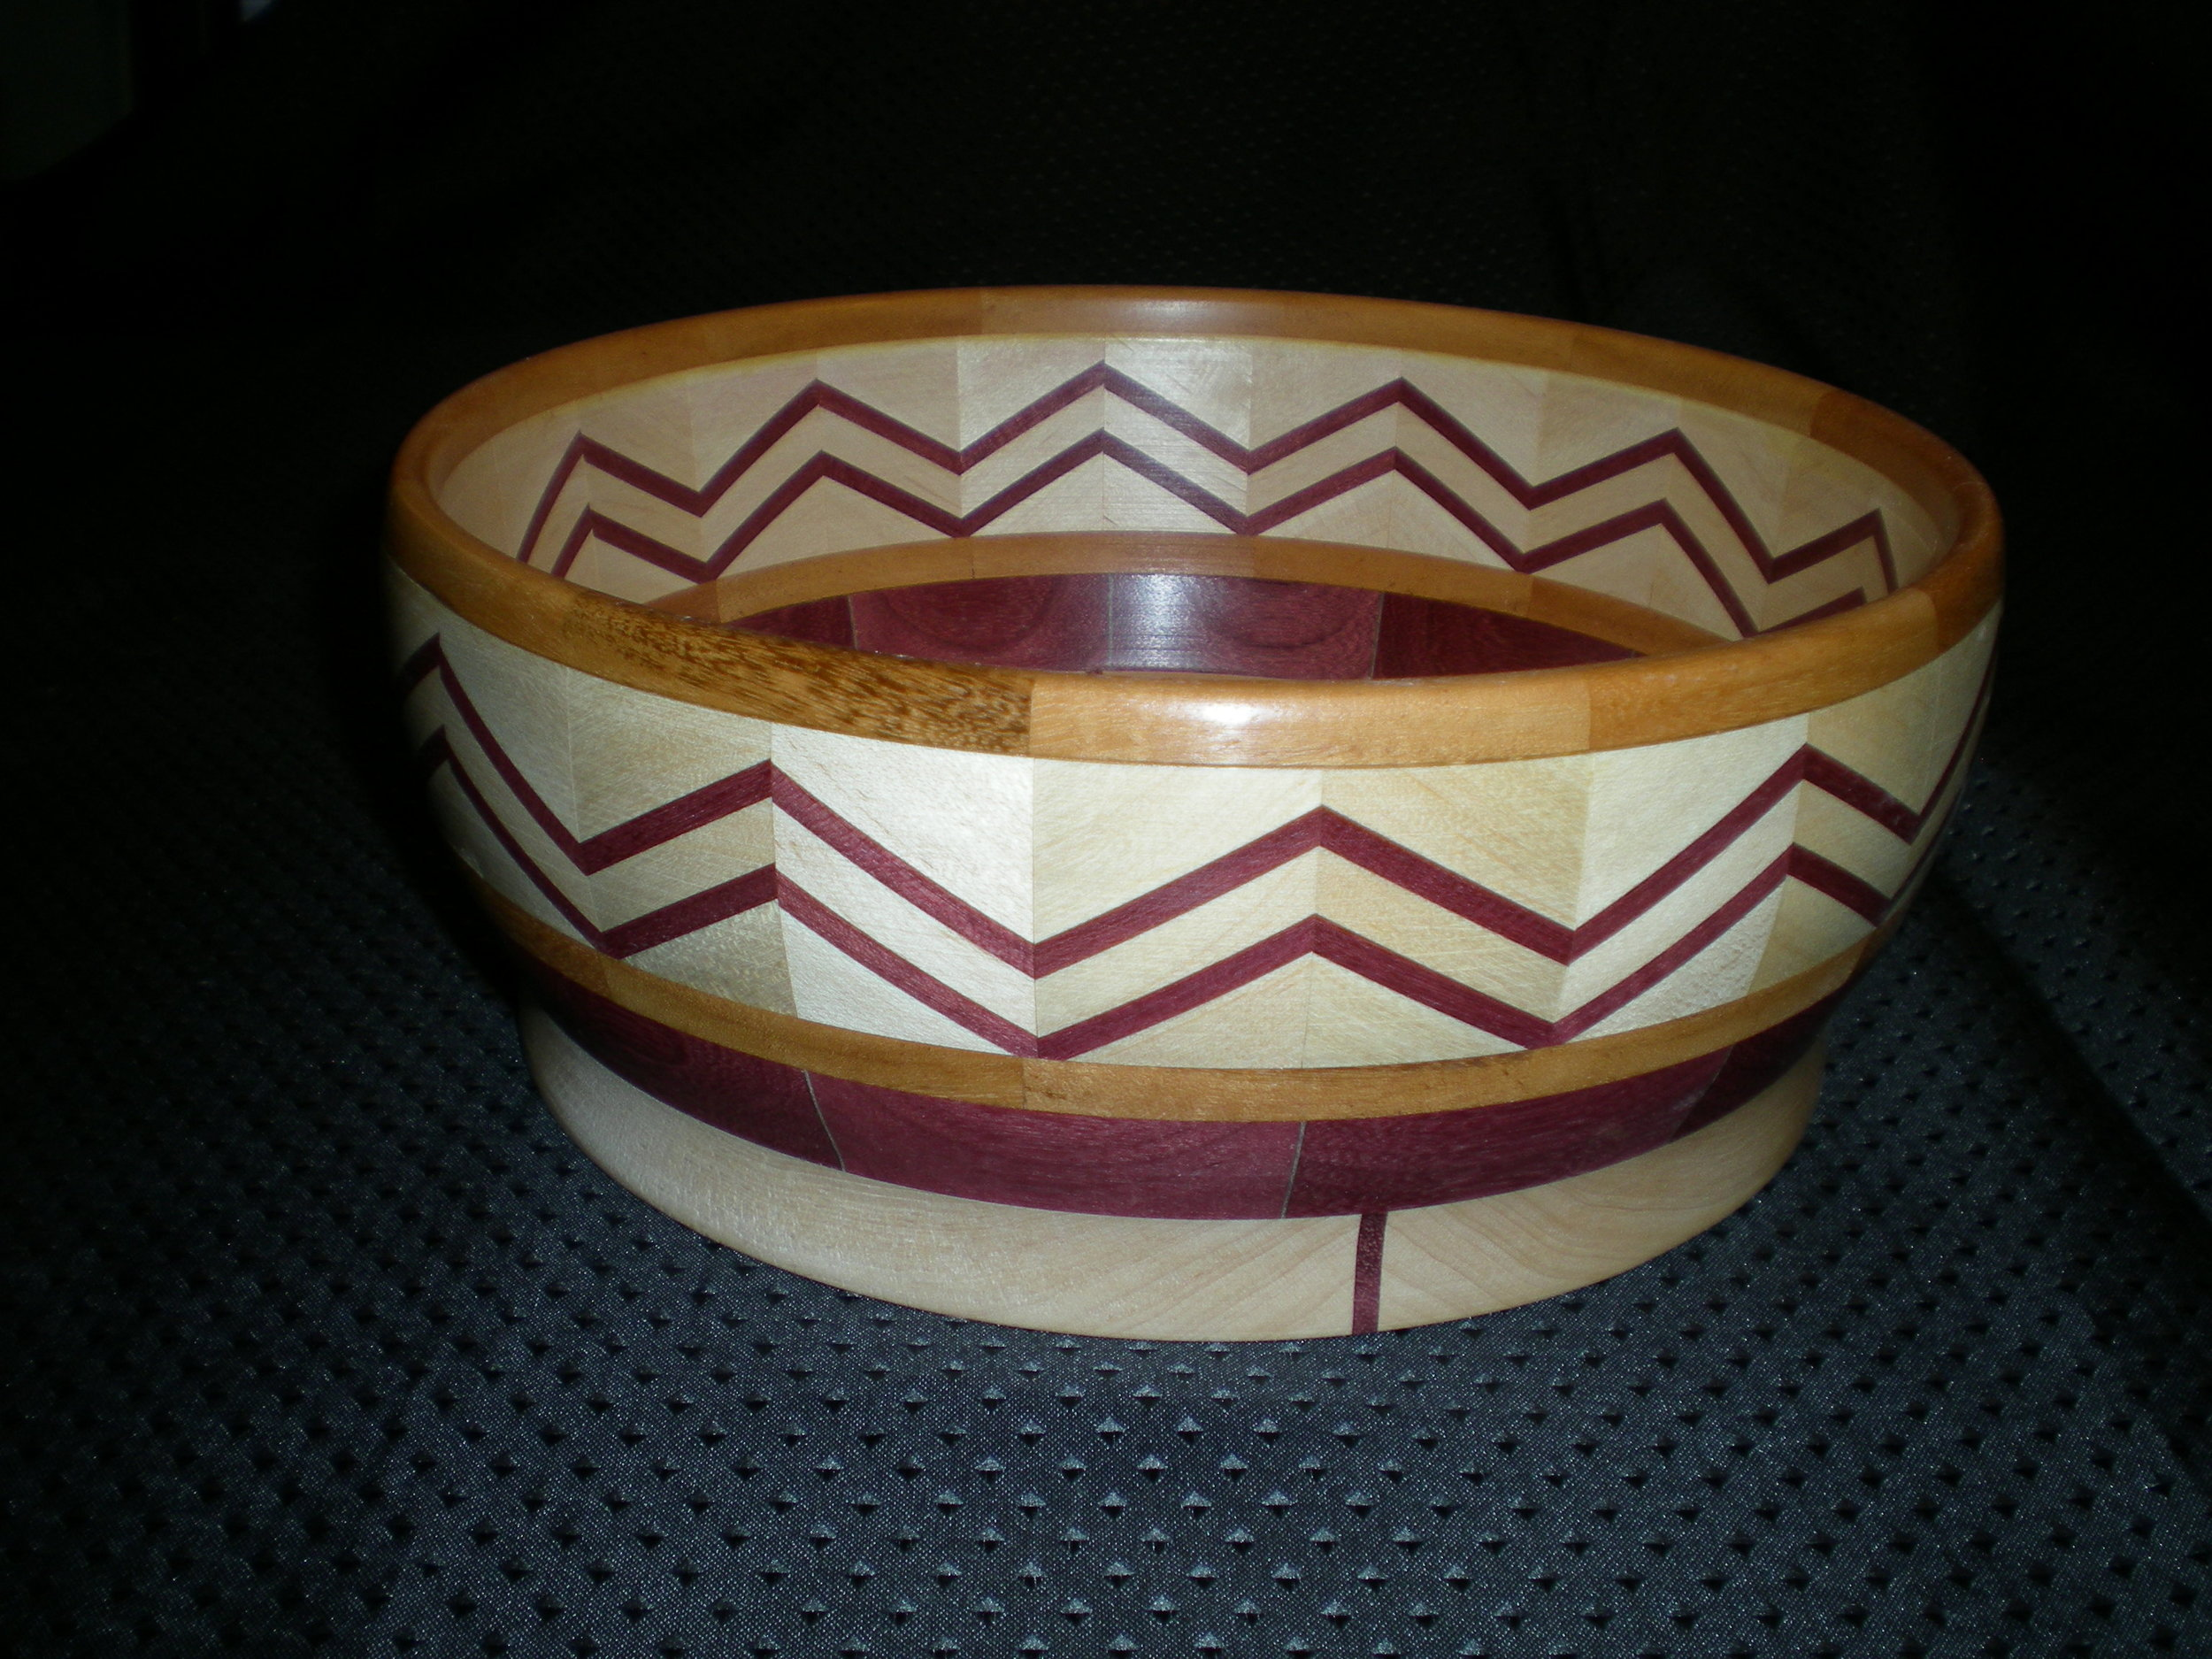 RJC Wood Creations - Bowls (16).JPG